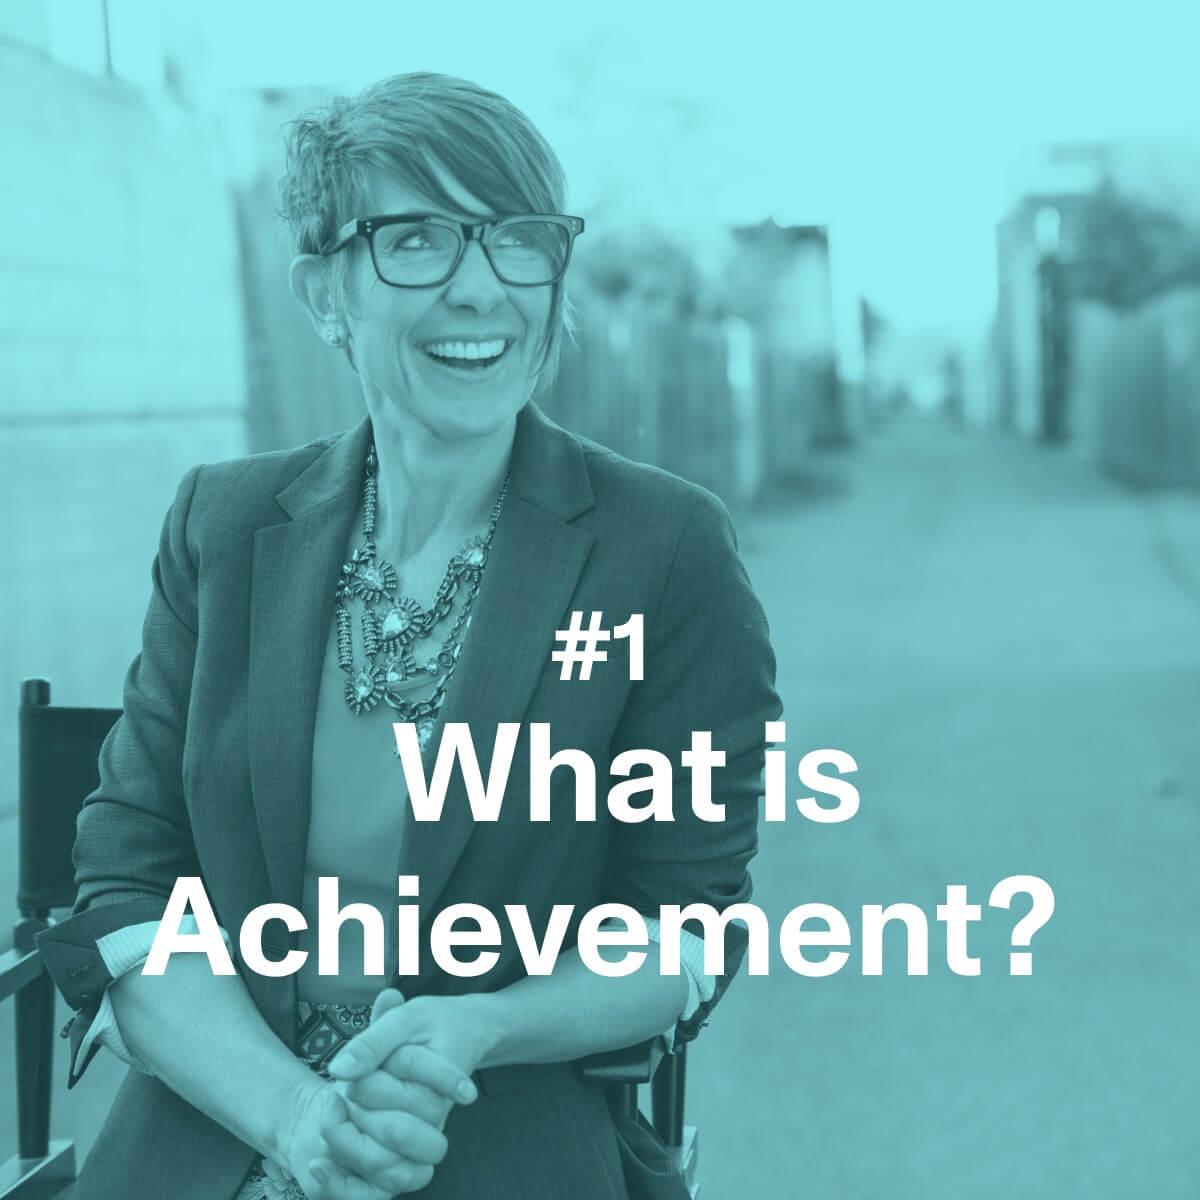 What is Achievement?